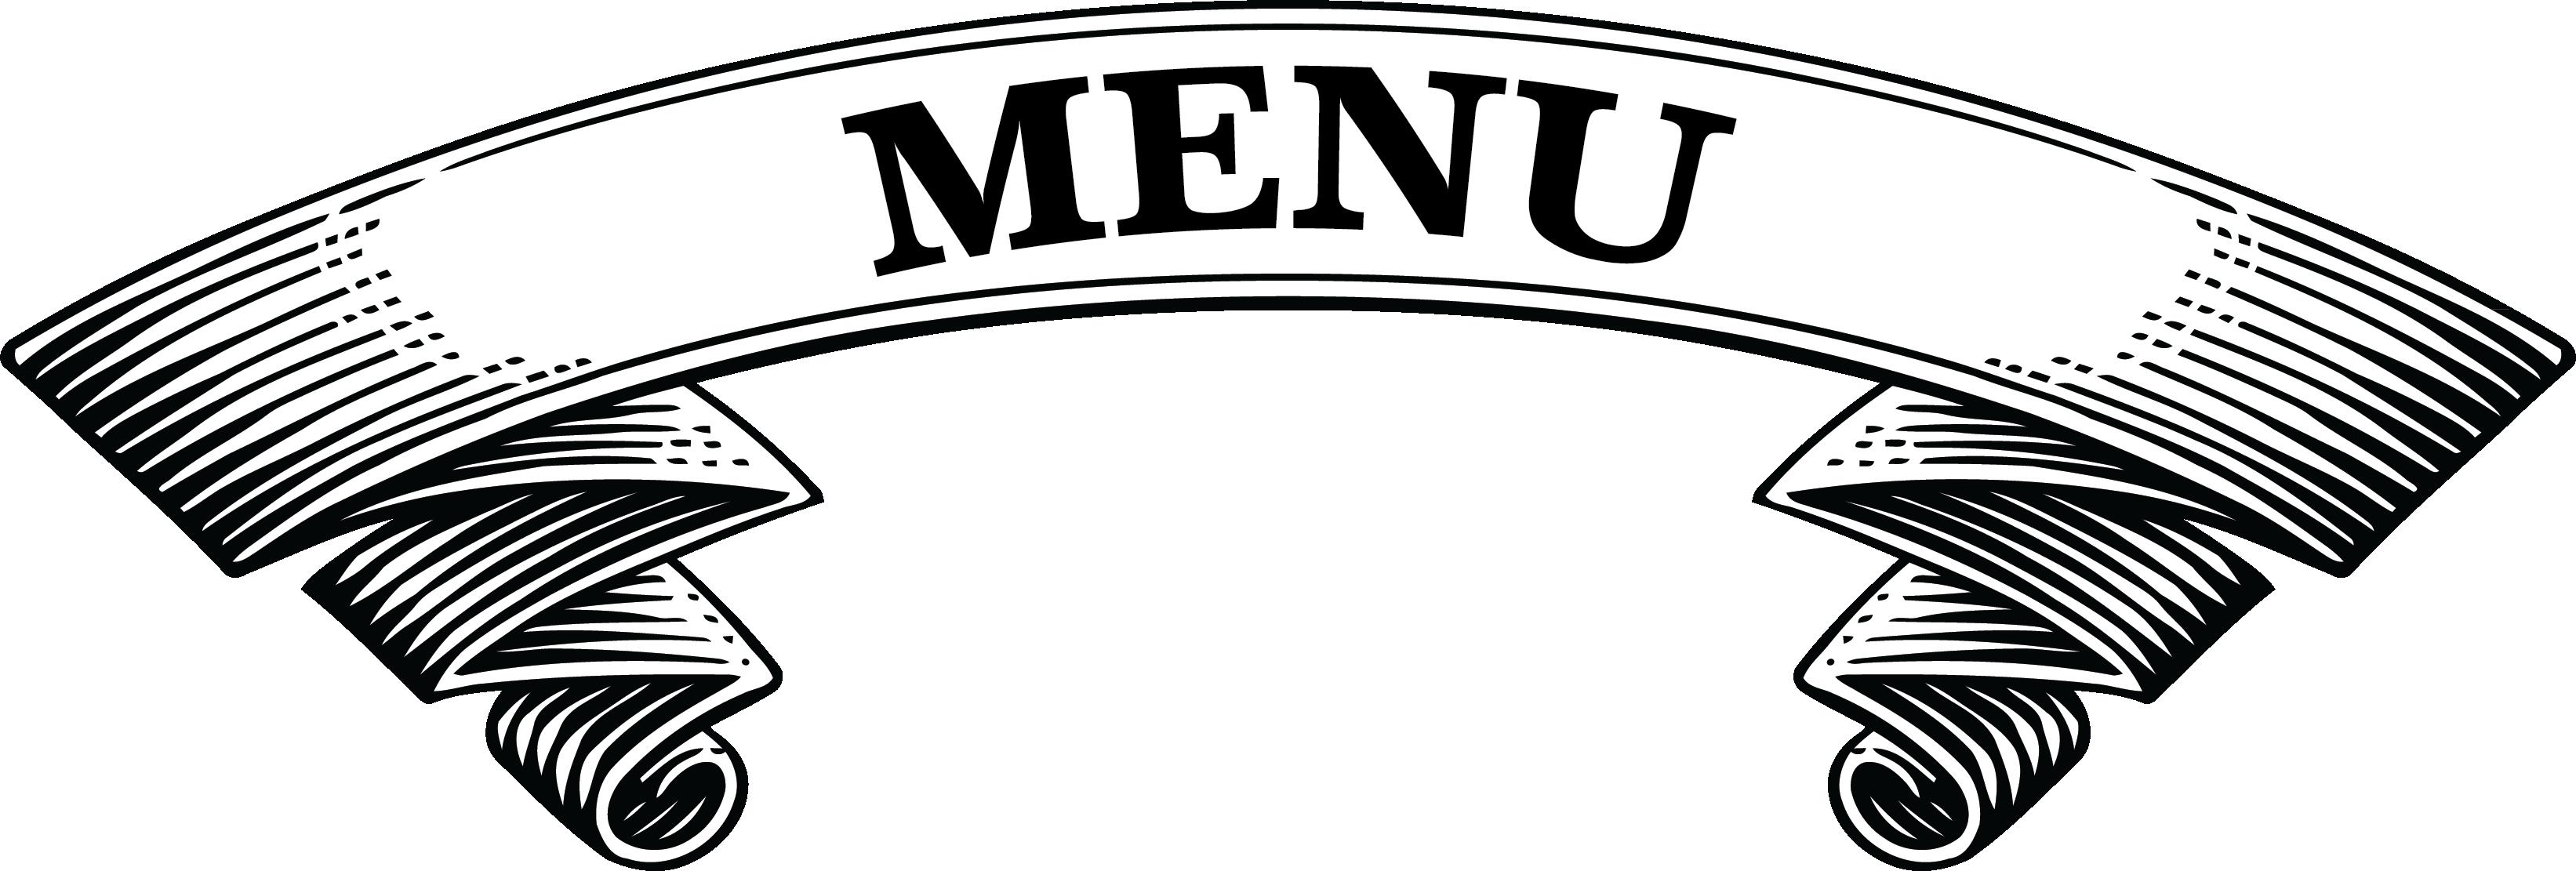 Clipart restaurant restaurant menu. Gardners inn blue mountains